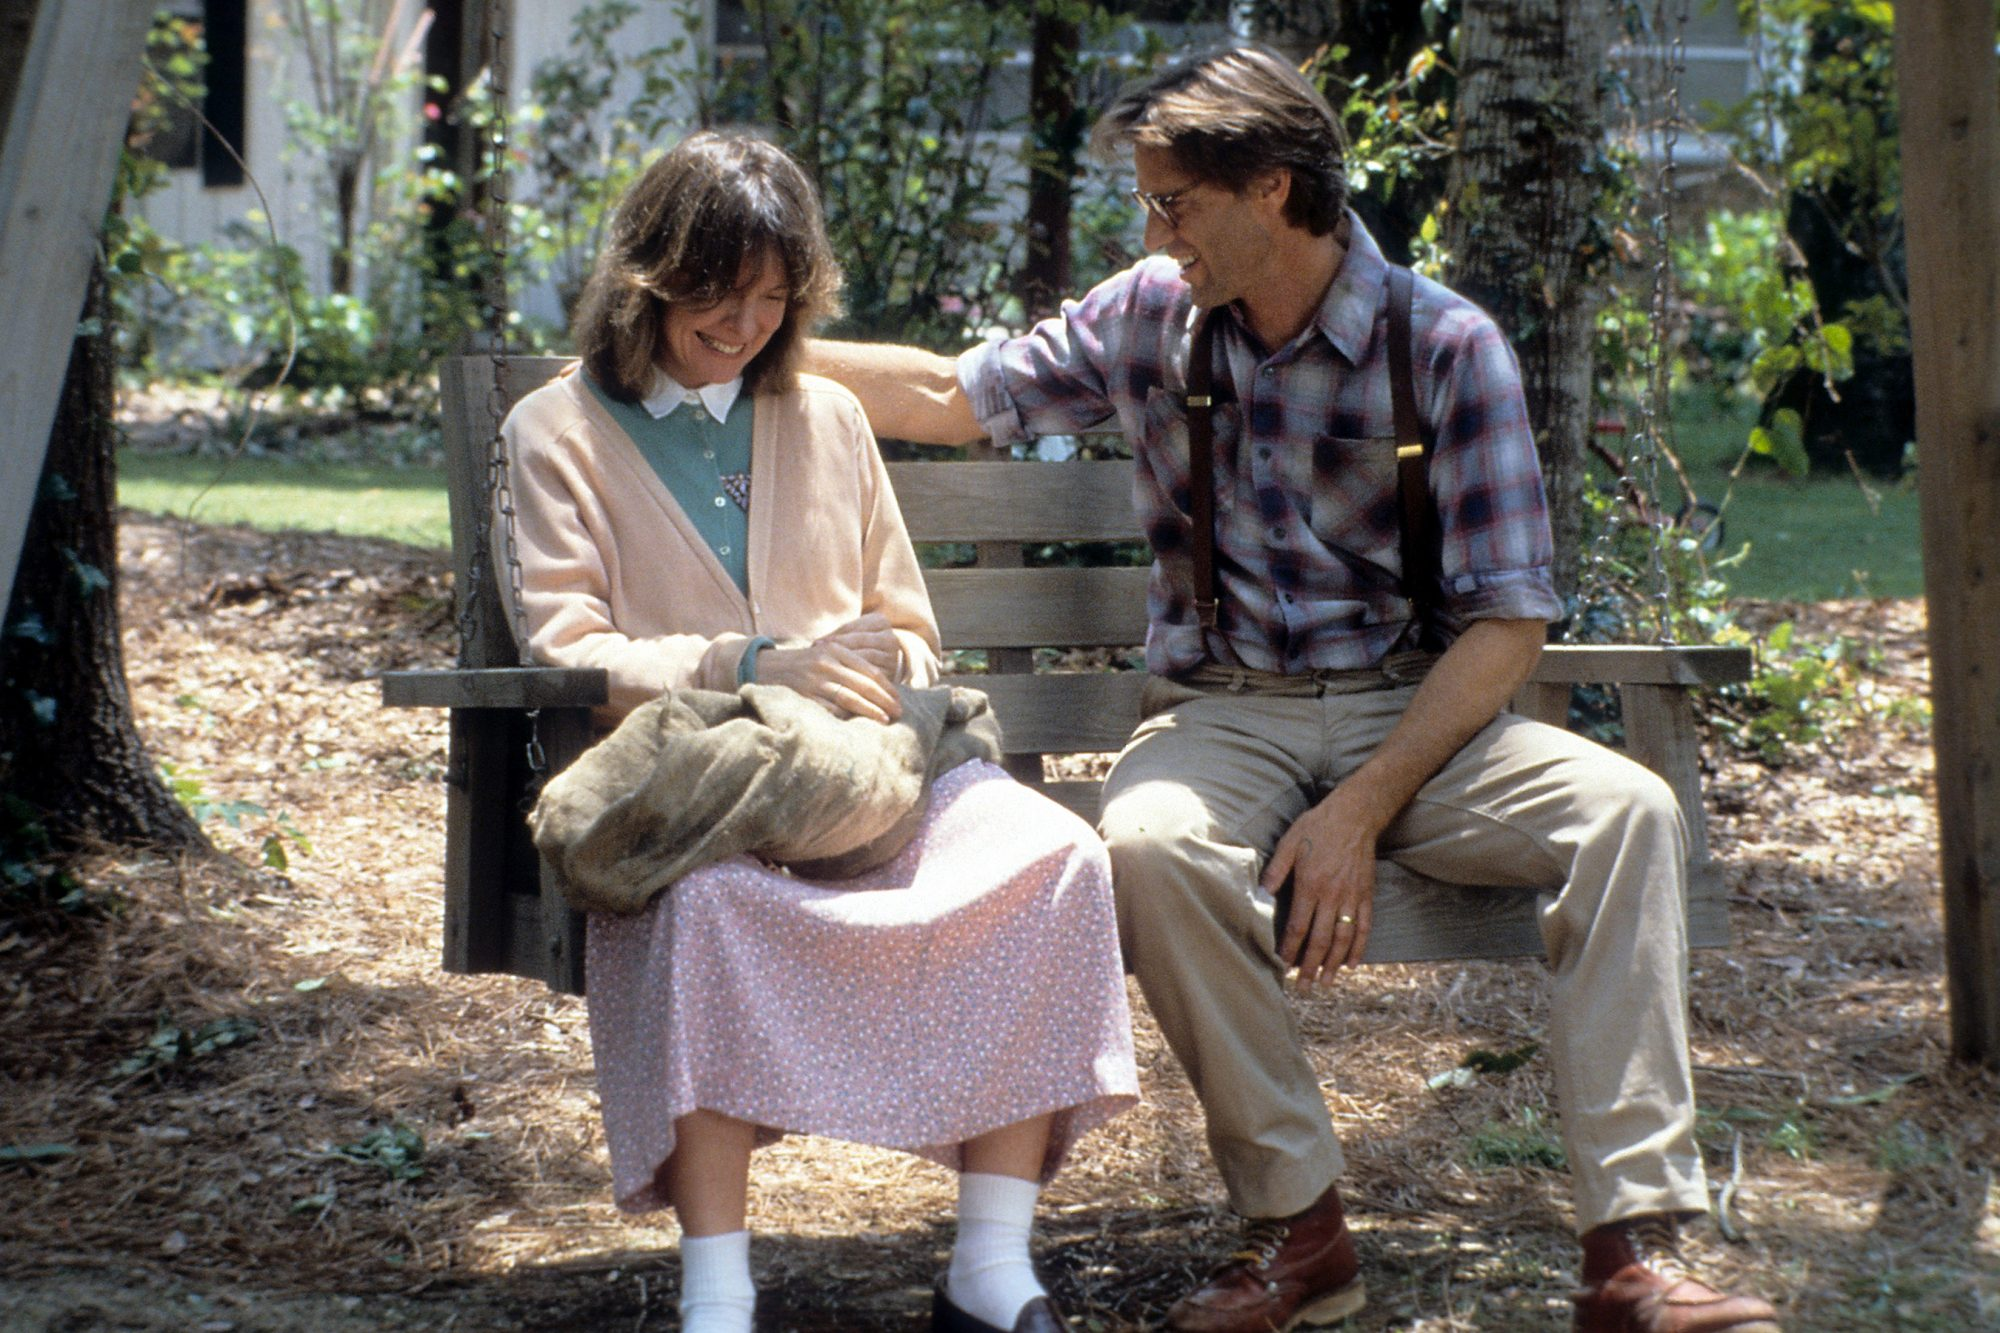 Diane Keaton And Sam Shepard In 'Crimes Of The Heart'